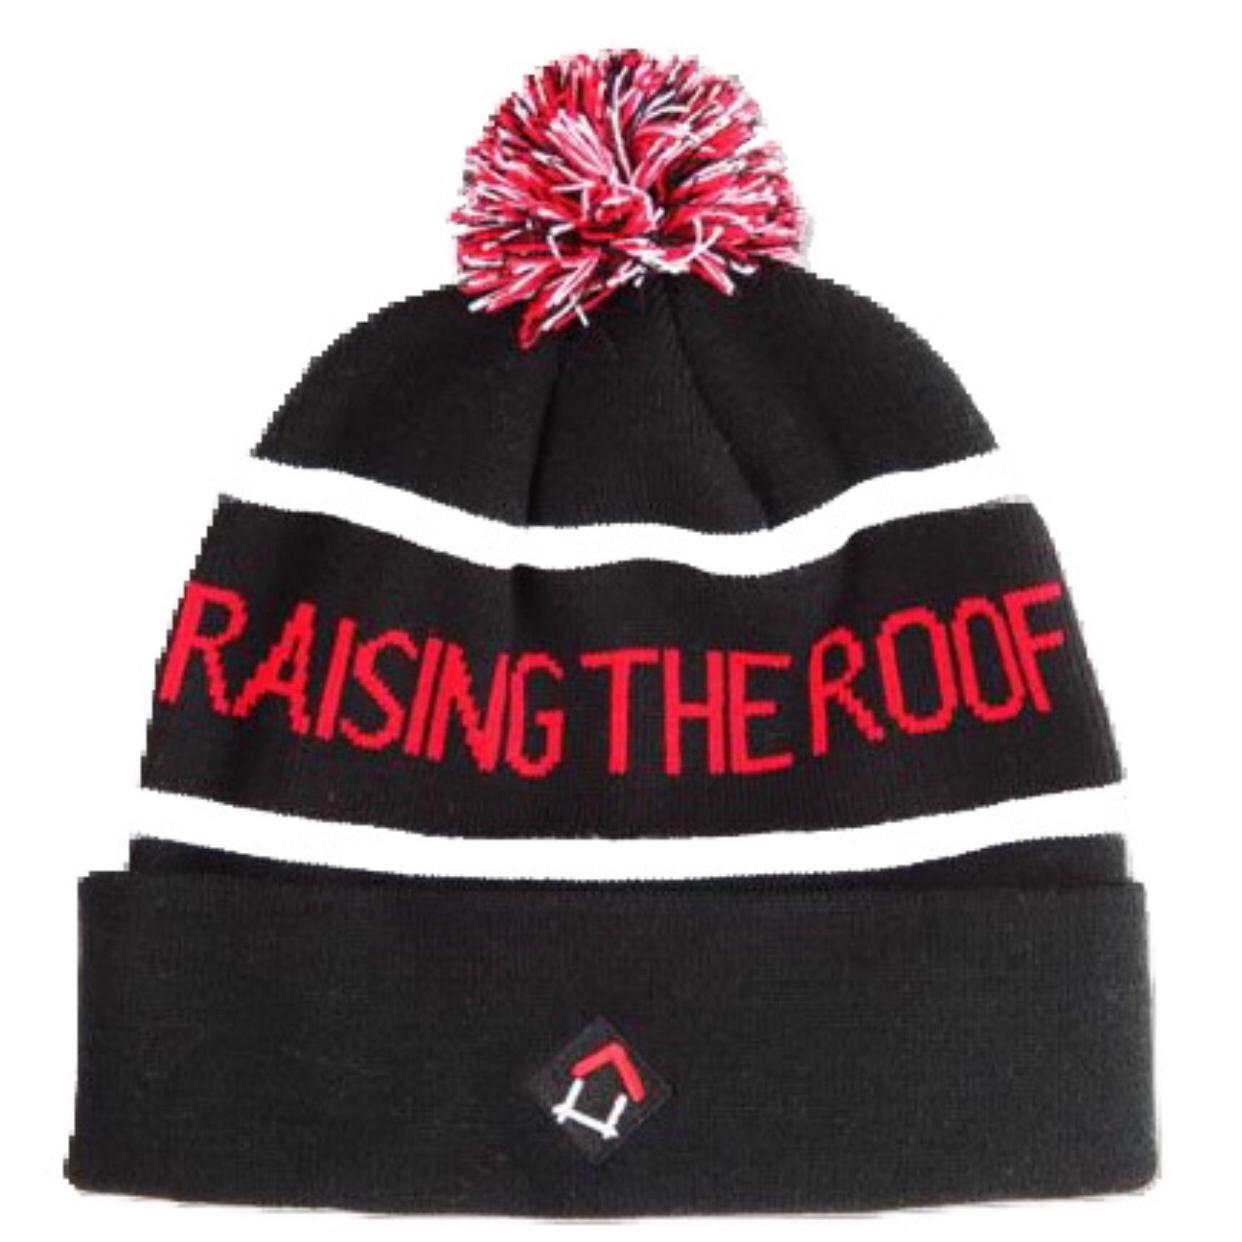 Raise The Roof Hat.JPG